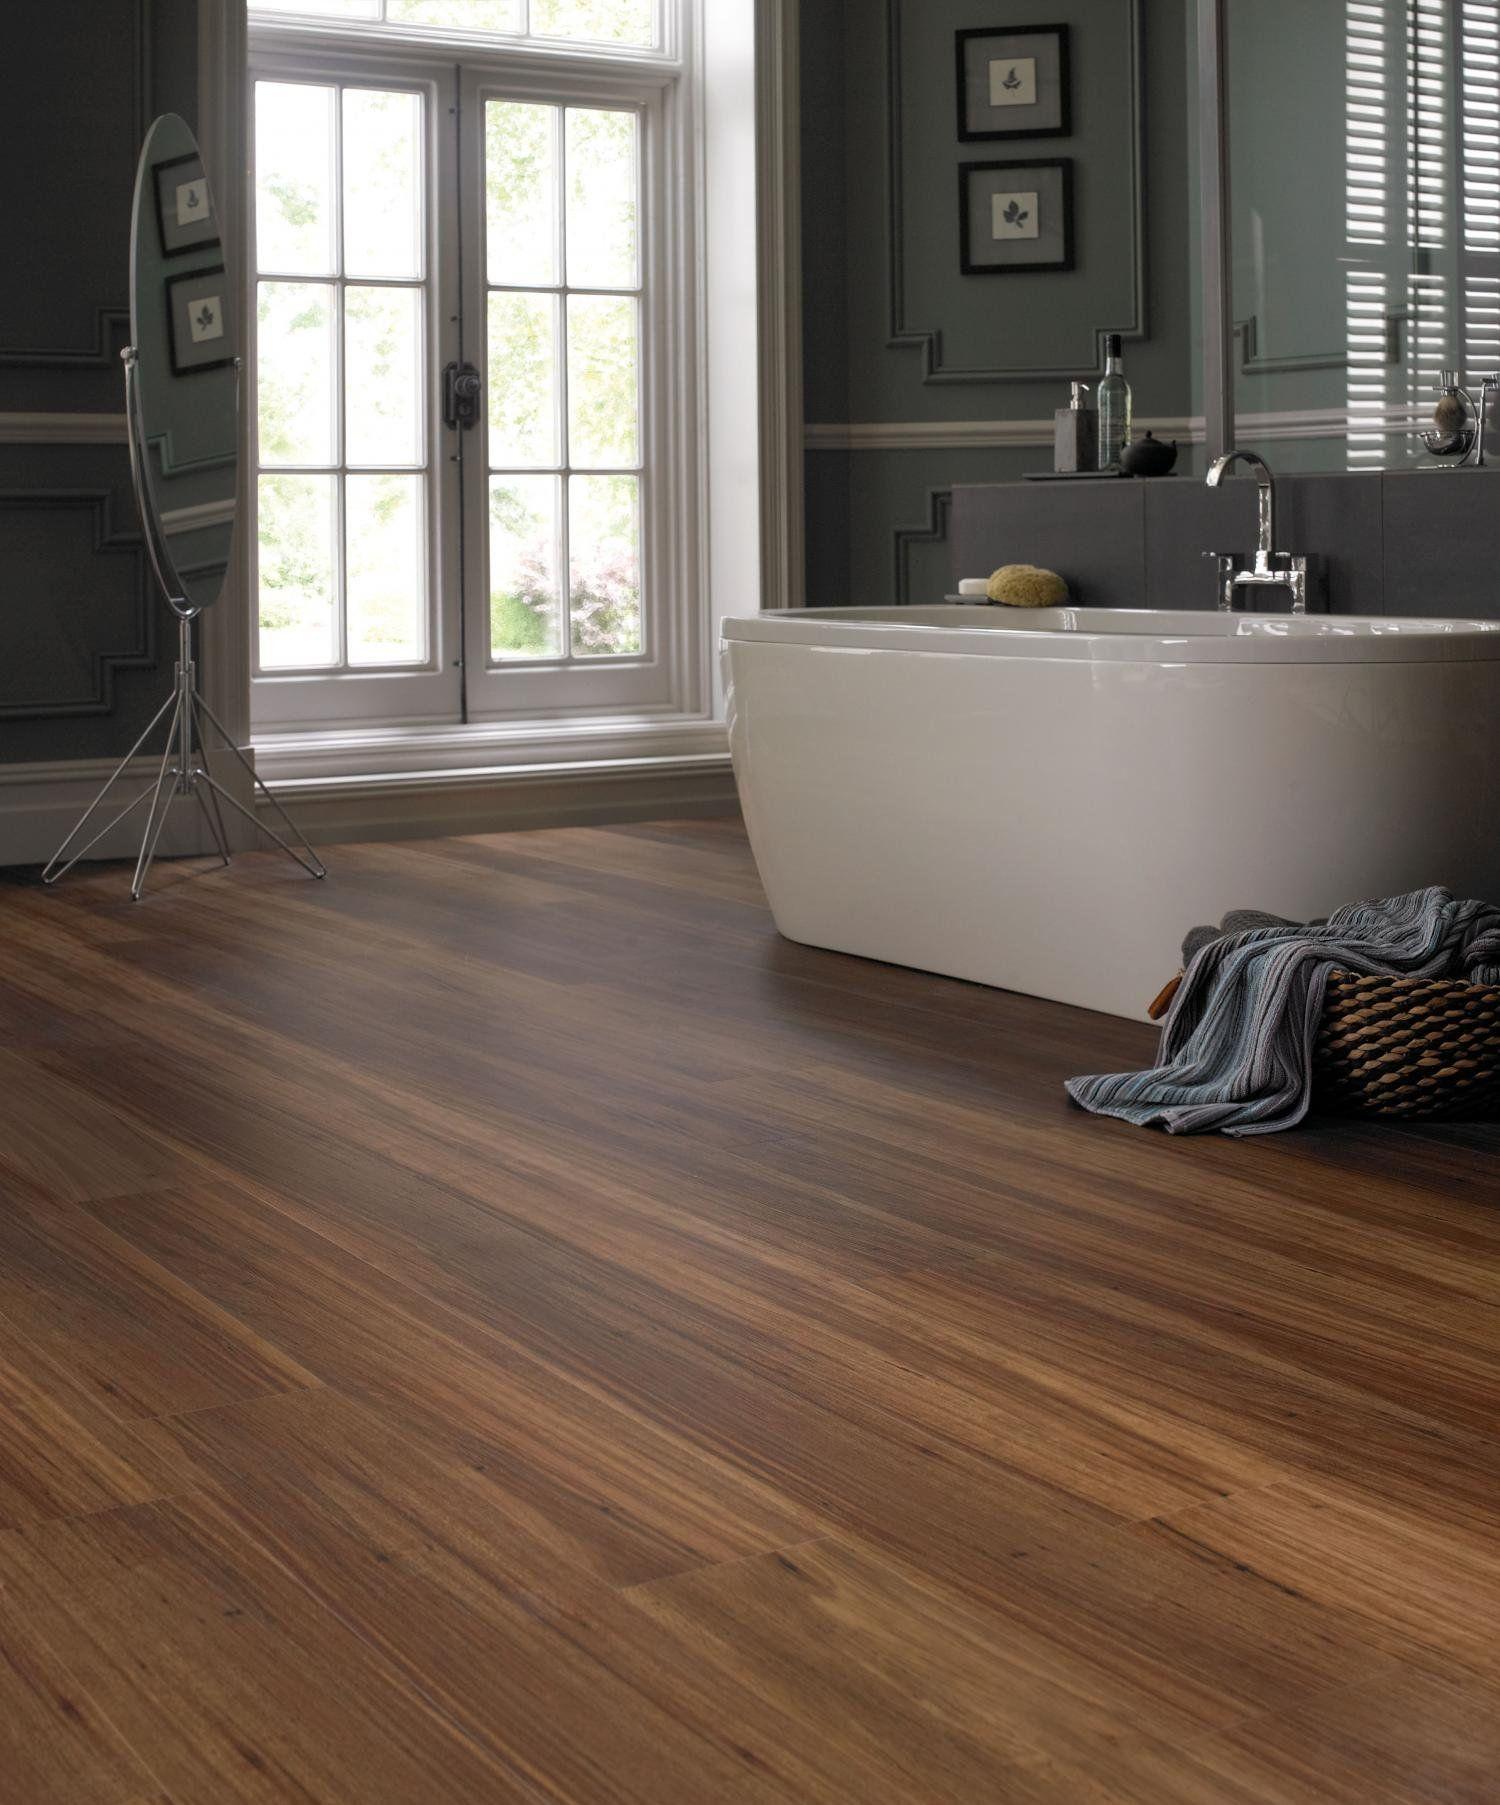 Spectacular Wood Look Tile Flooring Bathroom Design With